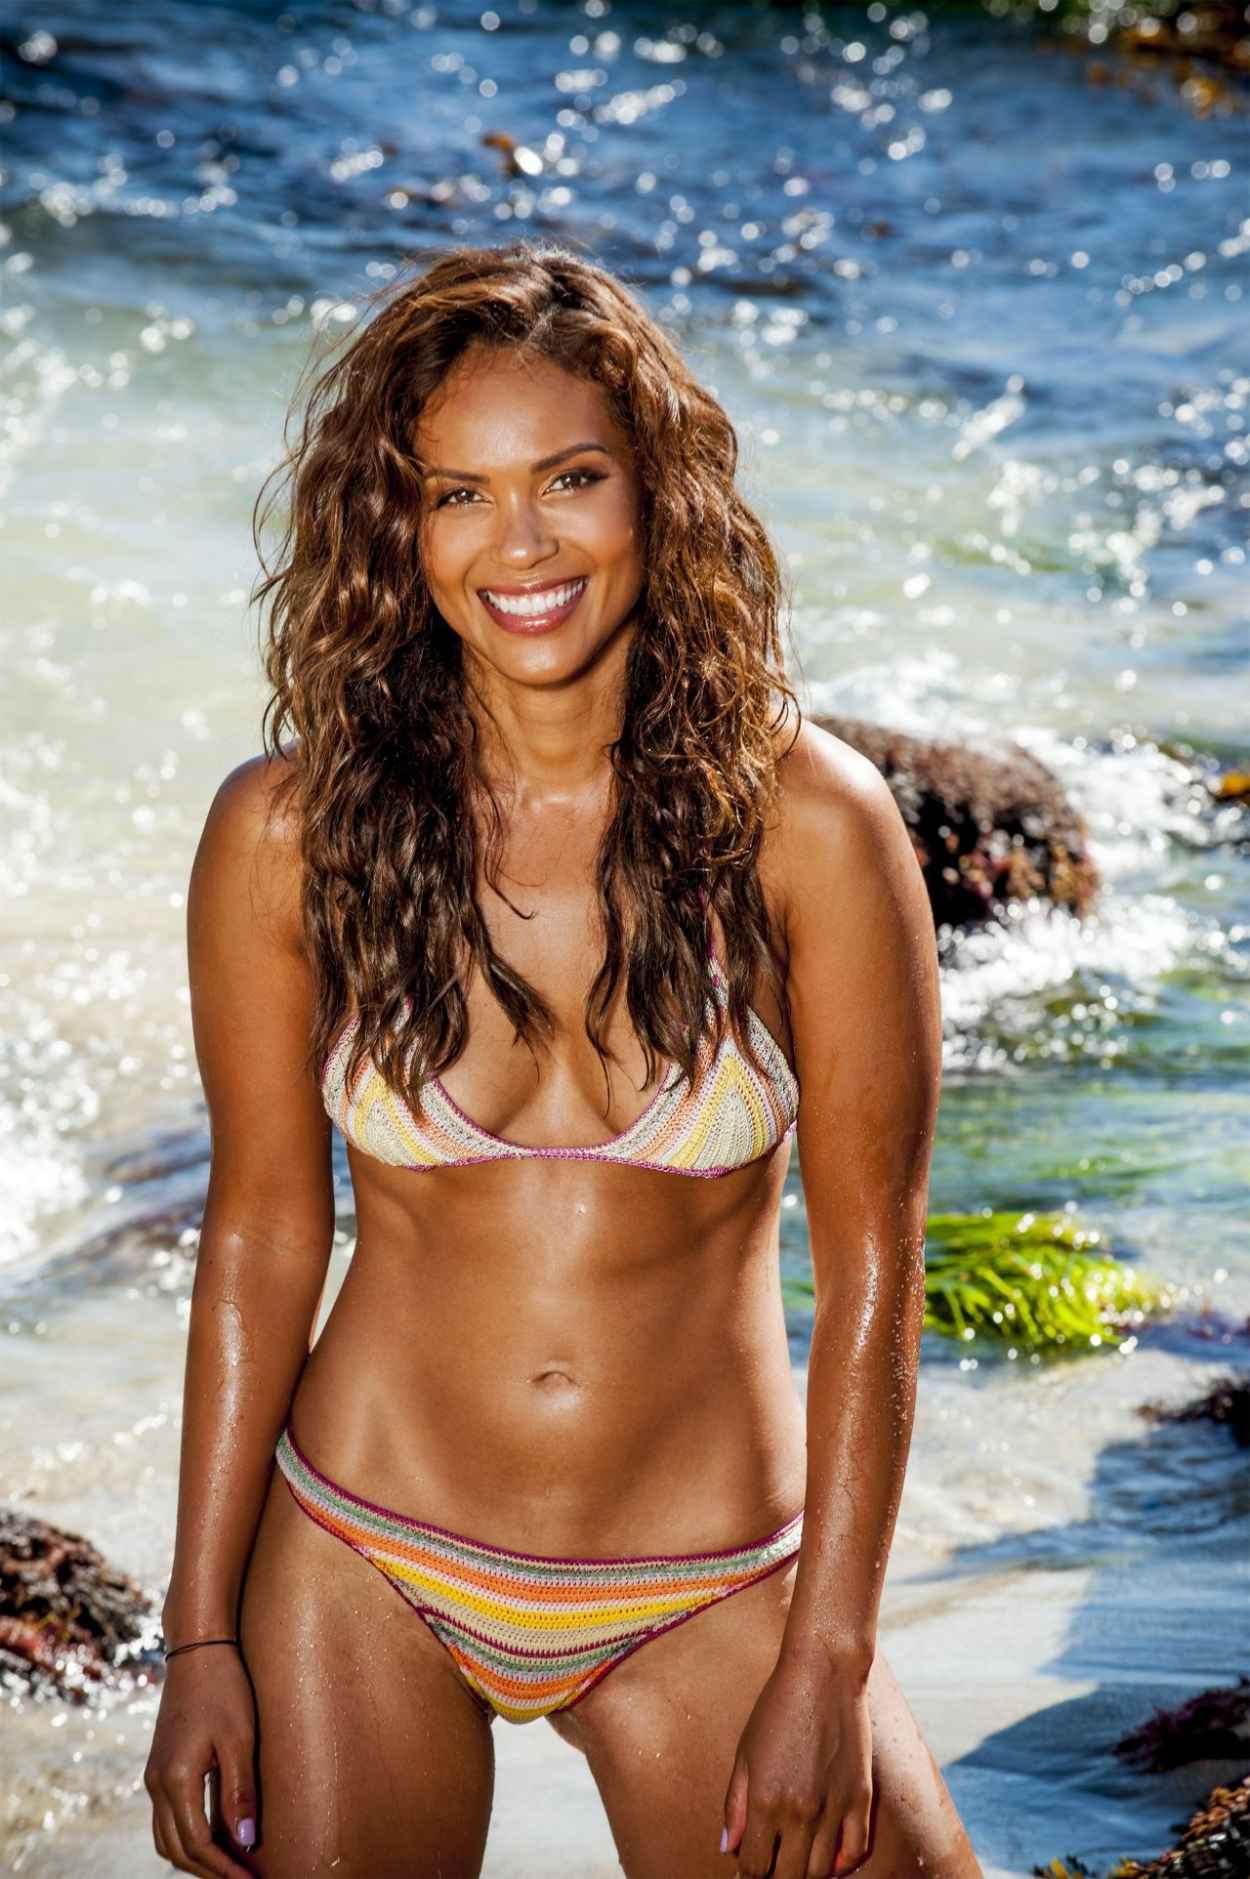 Lesley-Ann Brandt Photoshoot - Drift Promos (Bikini HQ Photos)-1